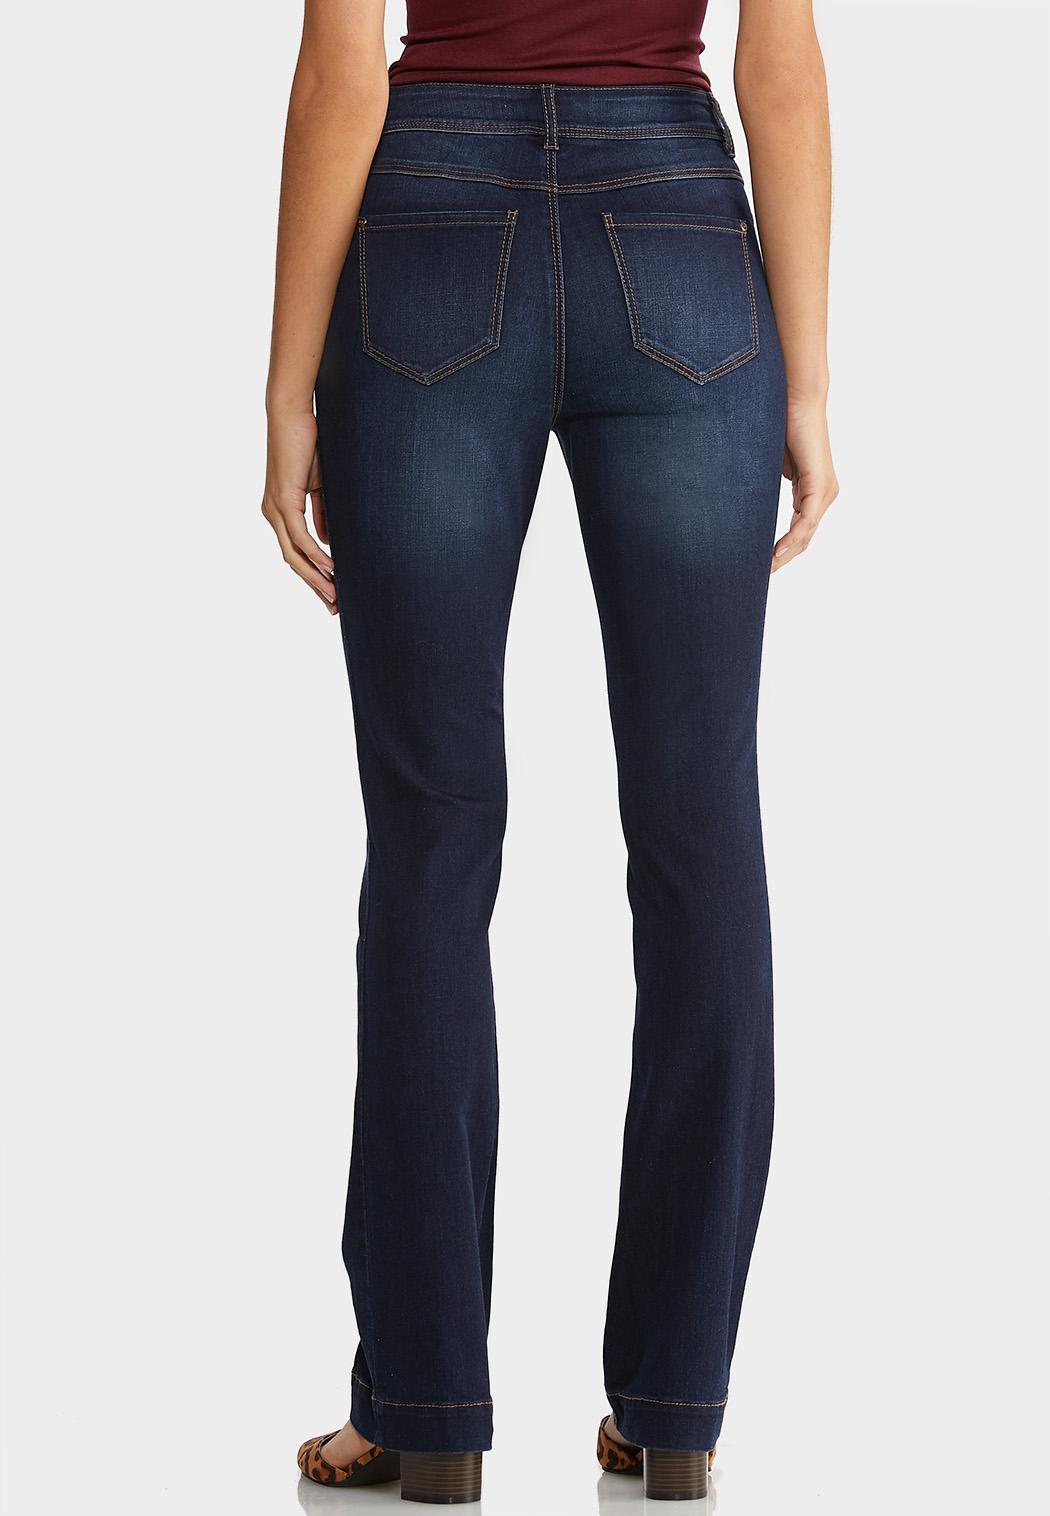 Dark Bootcut Jeans (Item #43932349)